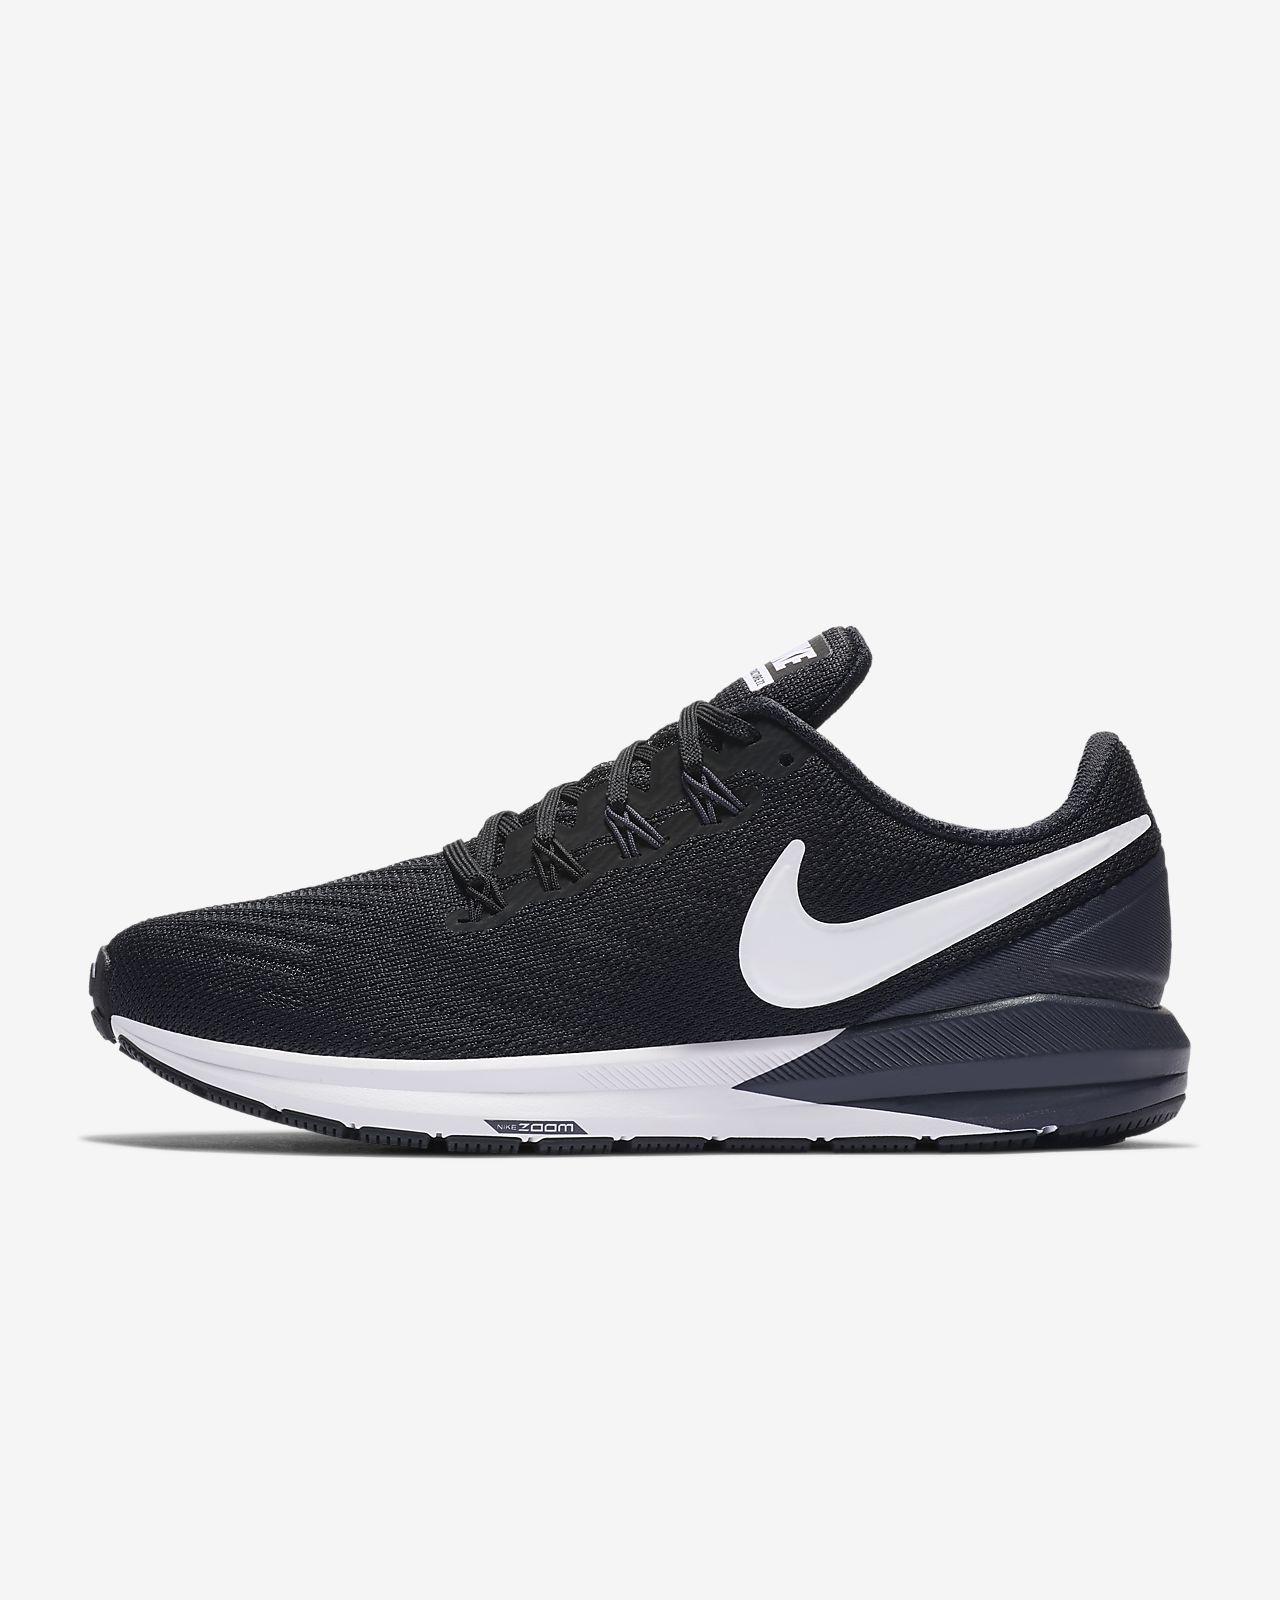 Nike Air Zoom, Nike Huarache, Nike SB Mulher, Homem